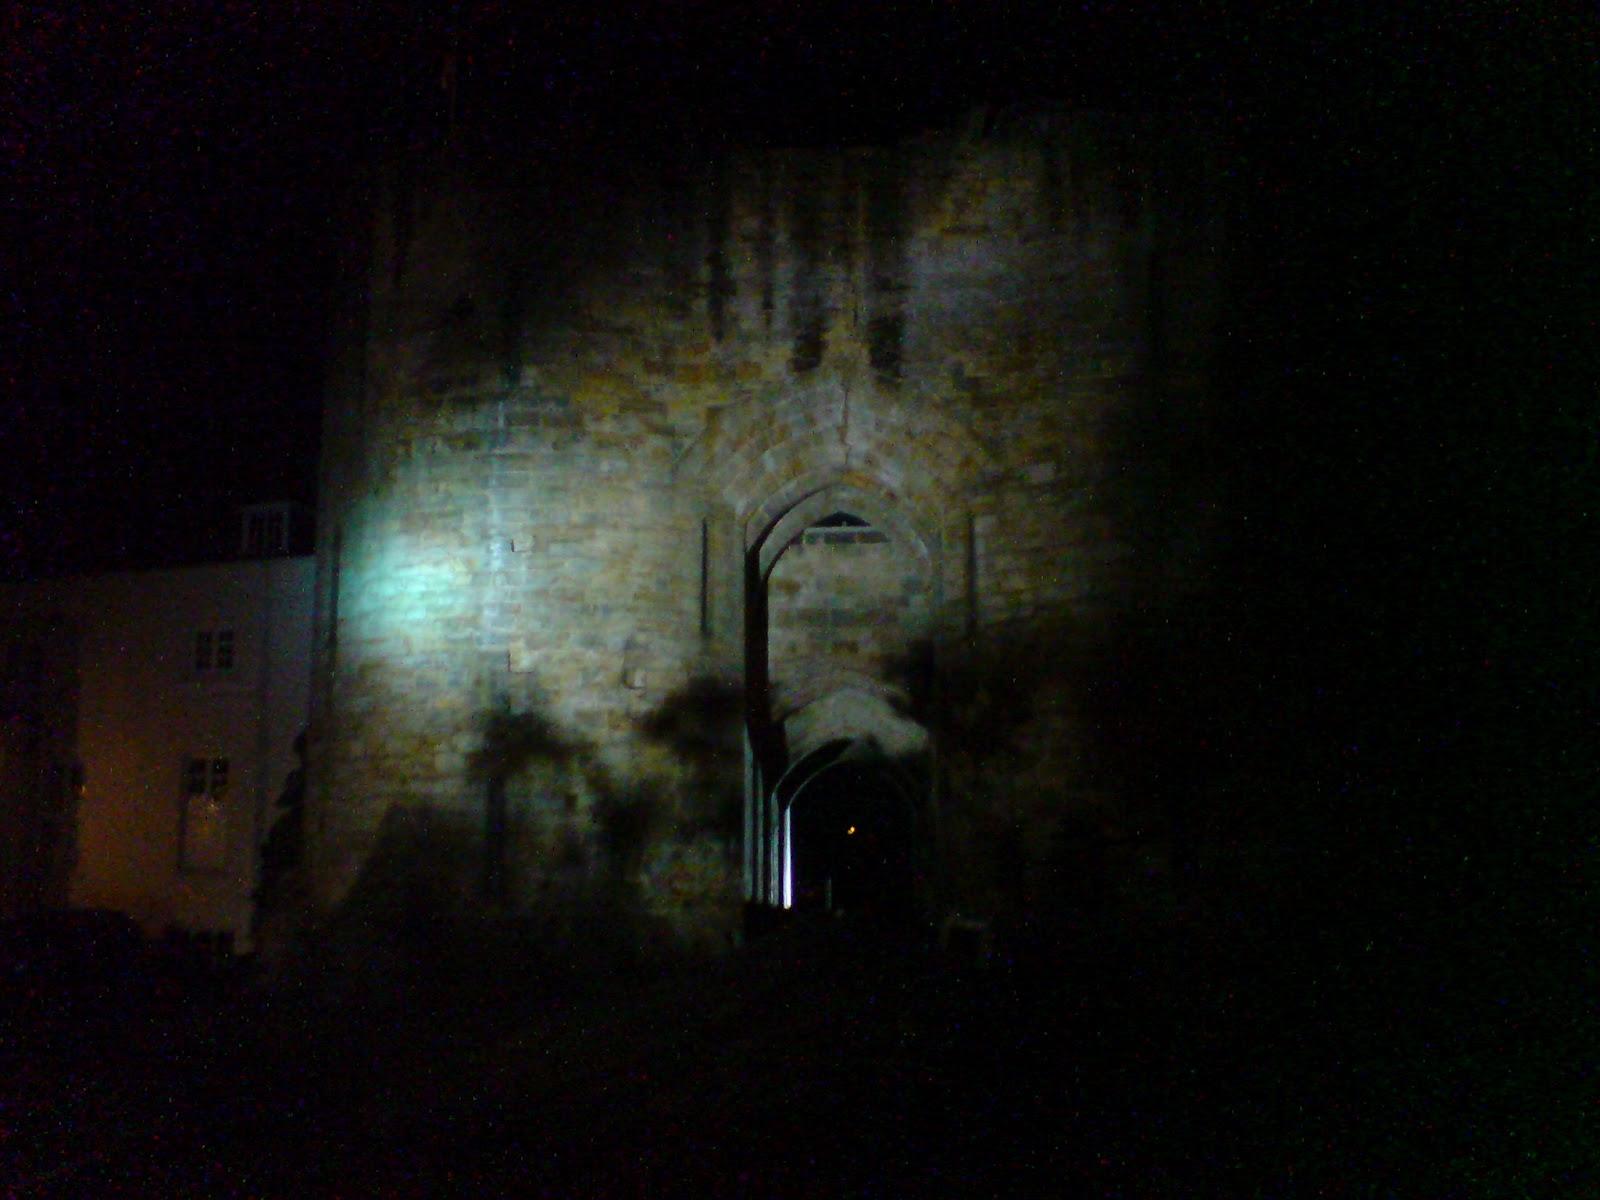 Mirror Night Castle wallpaper